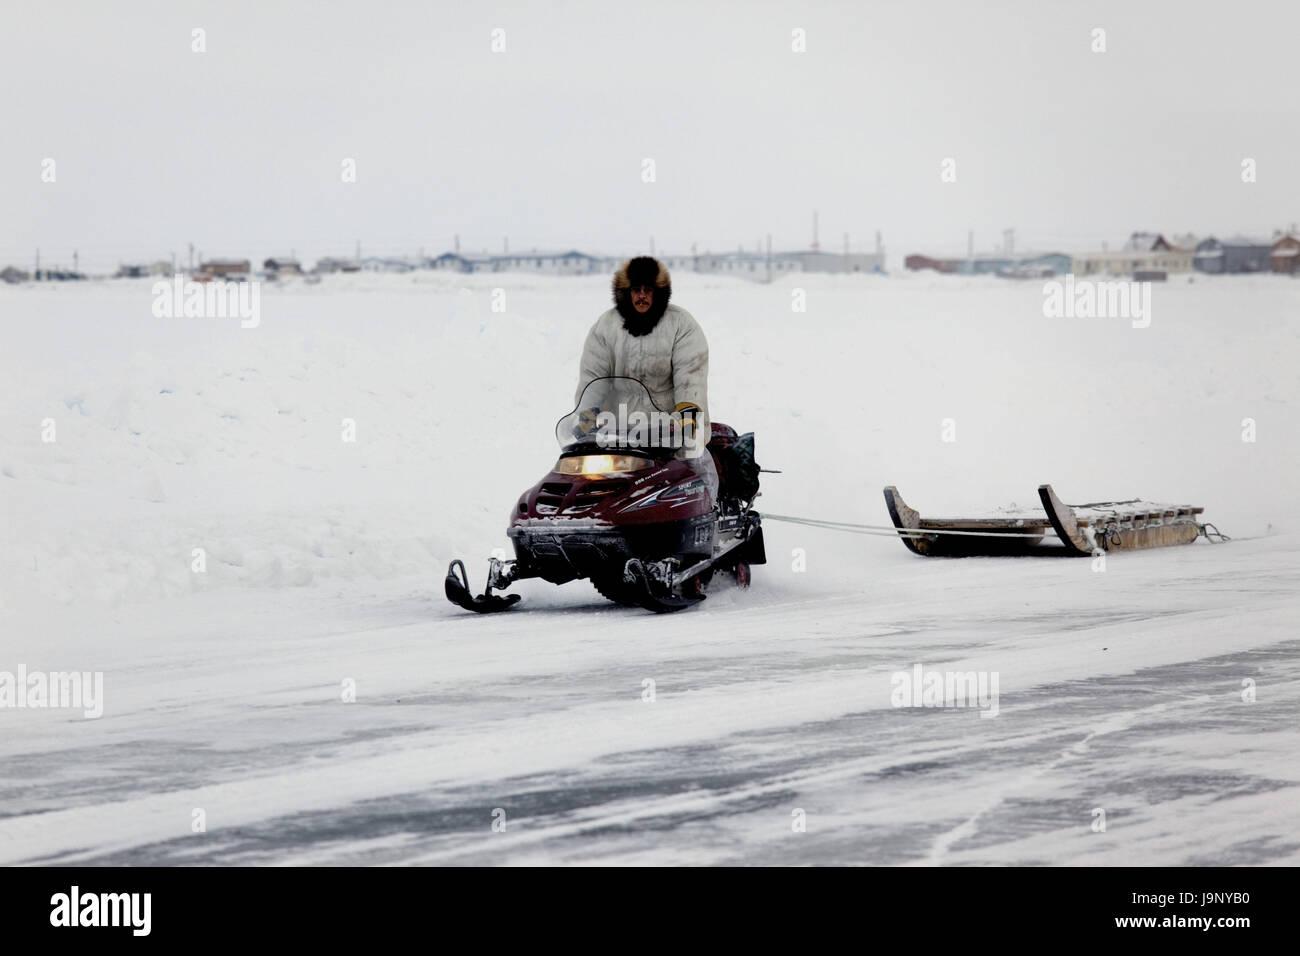 North America,Canada,north west territory,Northwest Territory,Iceroad,Tuktoyaktuk,Ice-Road,Tuktoyaktuk,Inuit,snowmobile, - Stock Image